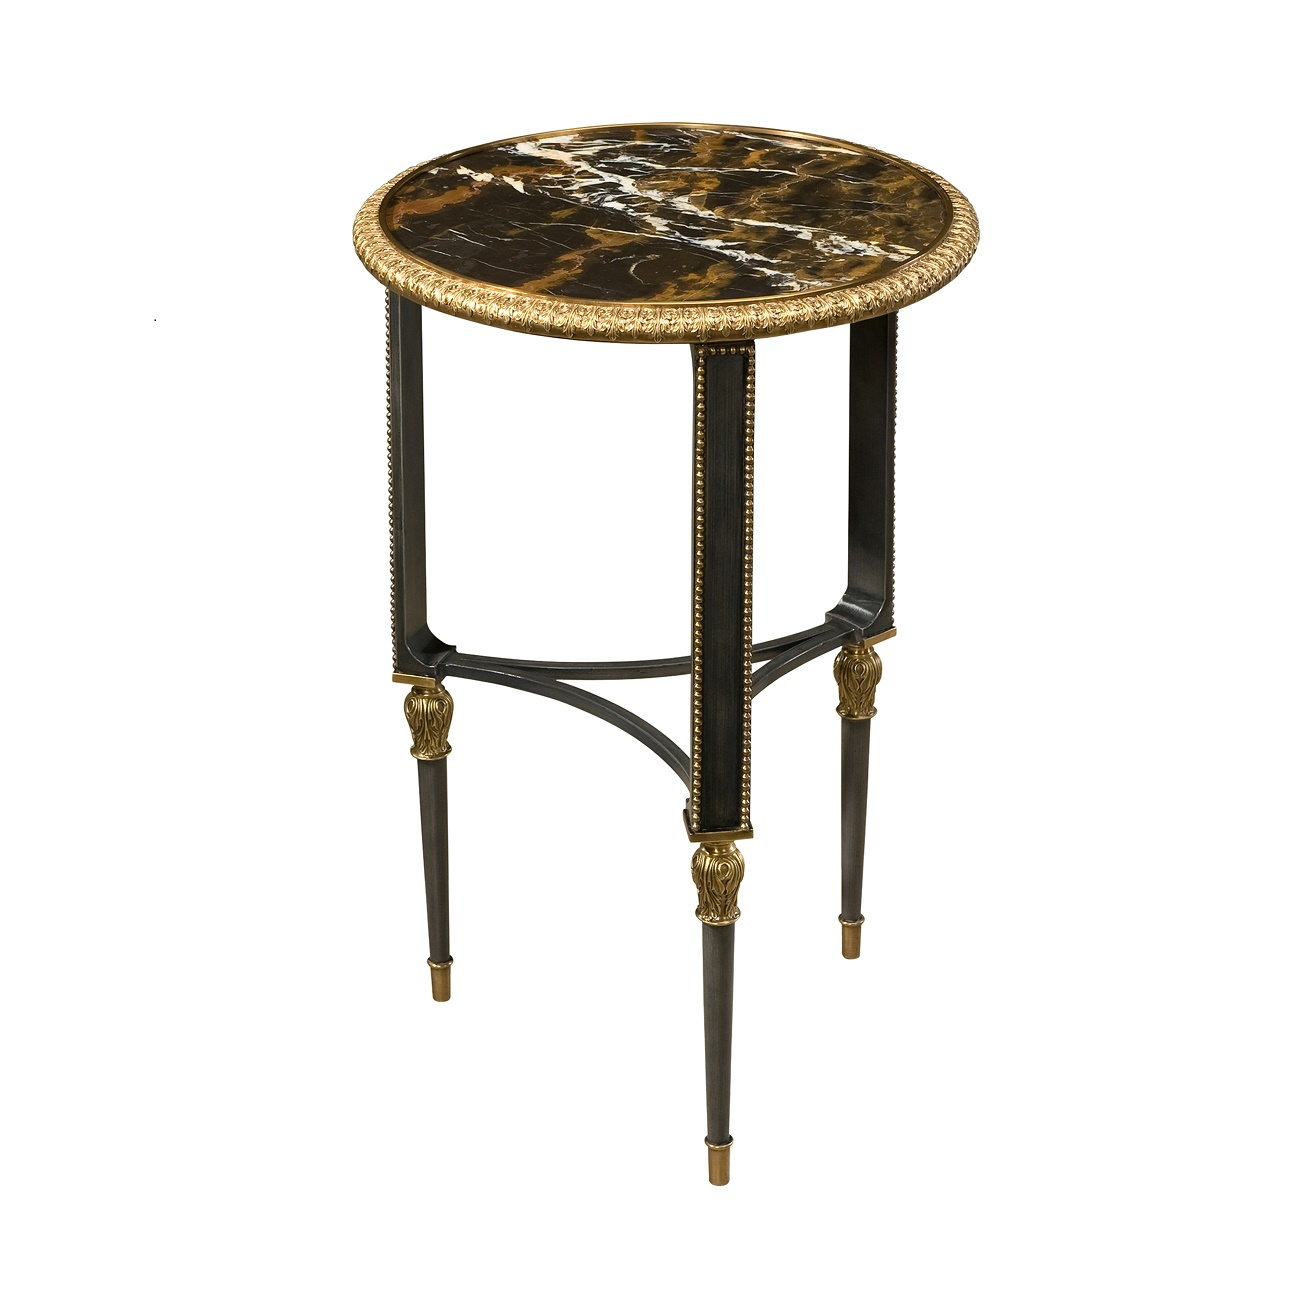 Theodore Alexander Ashford Accent Lamp Table Brooklyn, New York